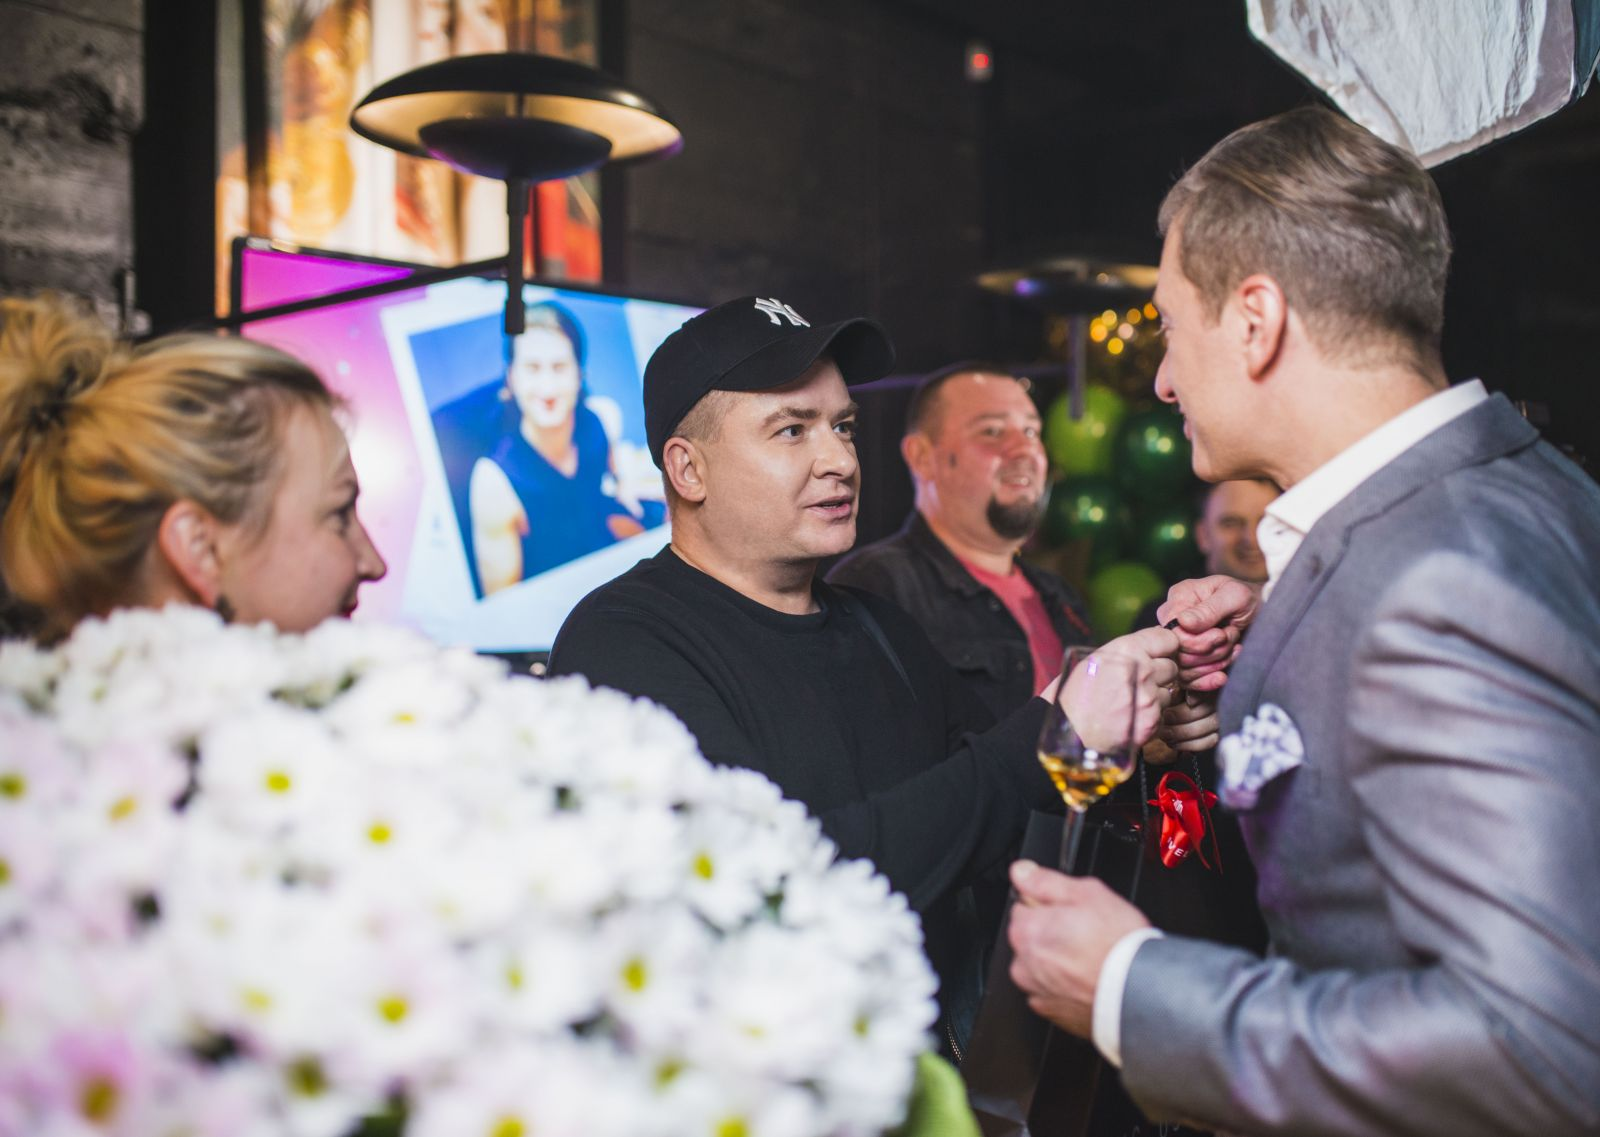 50-летие Юрия Никитина: Ирина Билык, Андрей Данилко, Ольга Горбачева и другие гости вечеринки